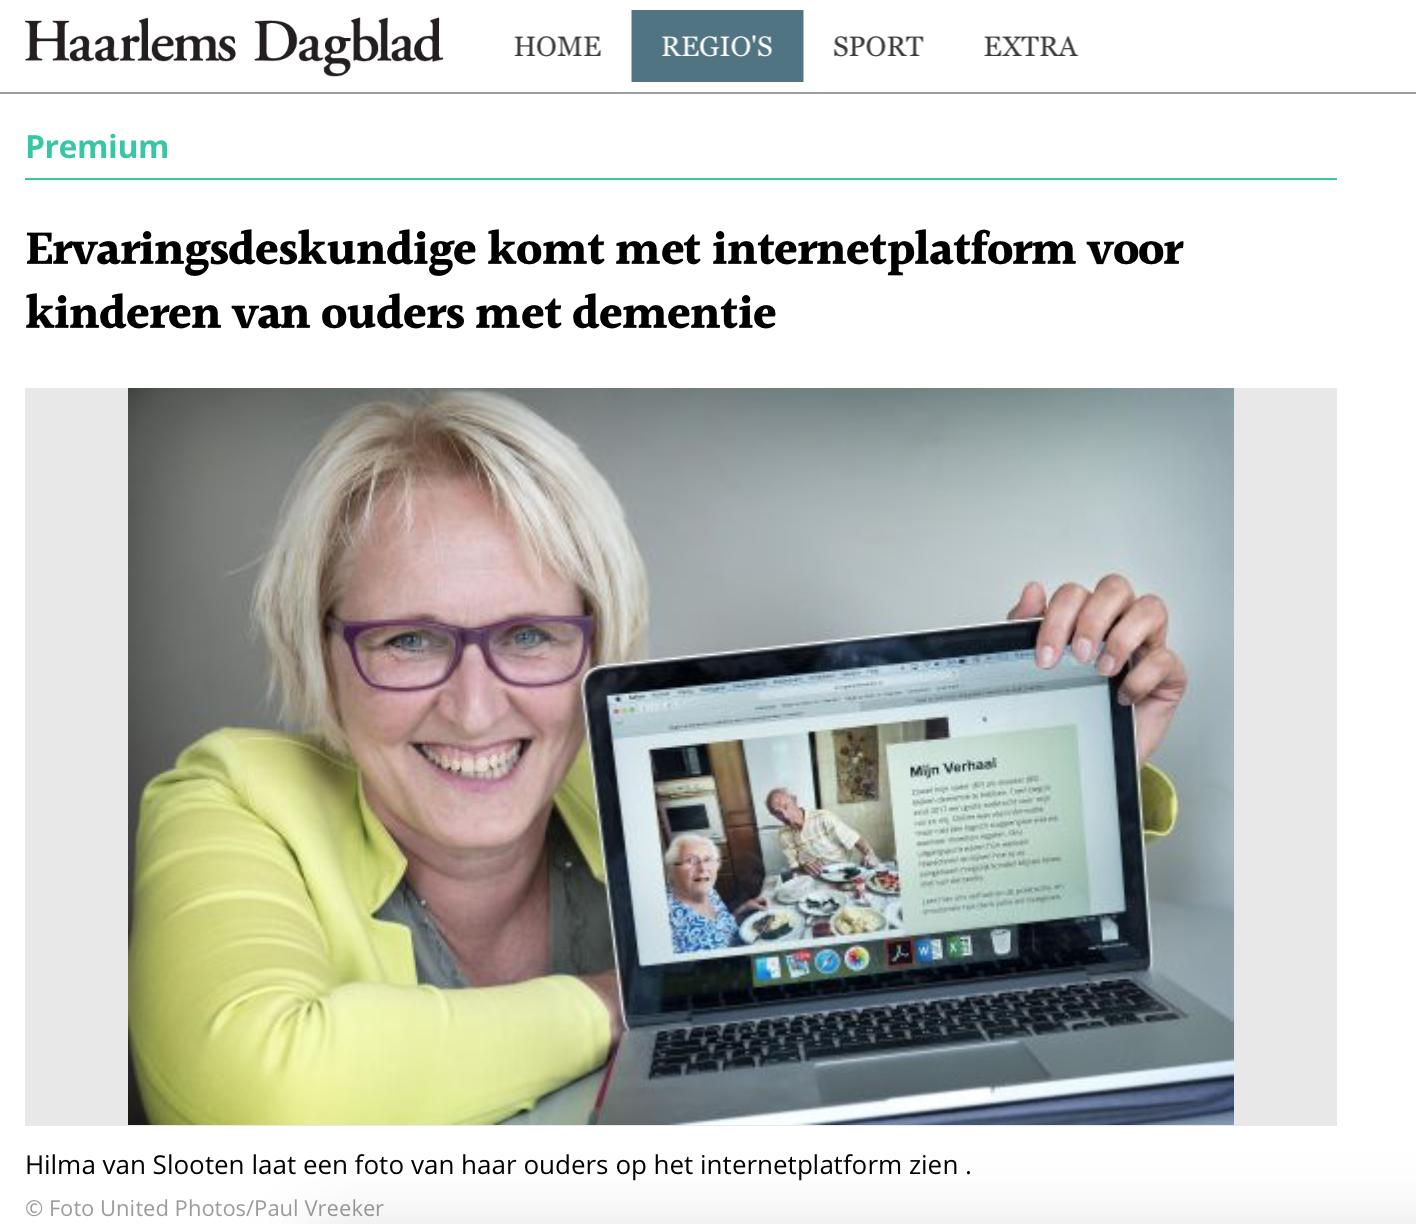 Haarlems dagblad21 september 2019 -